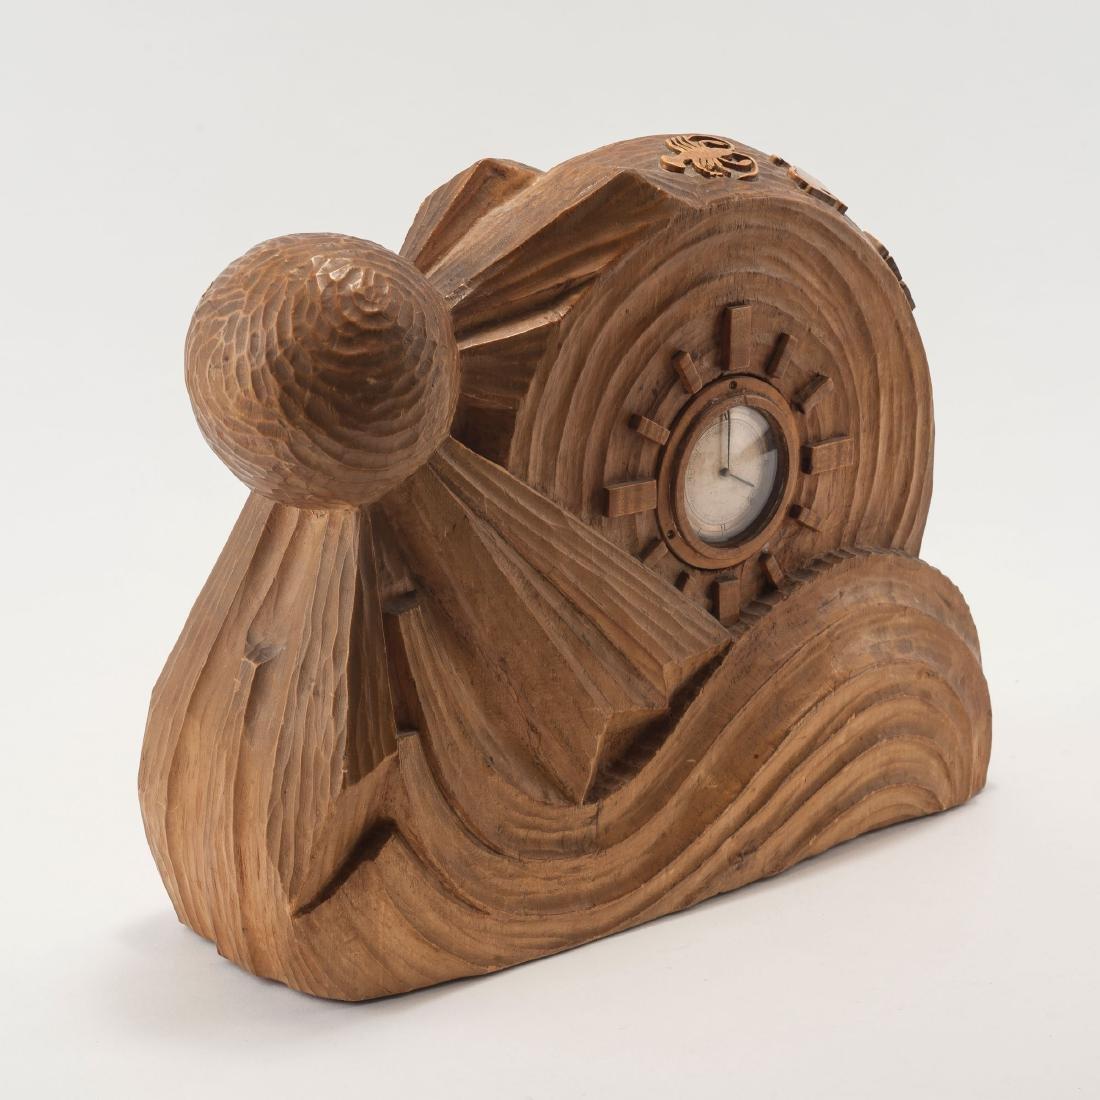 Anthroposophic table clock, 1920s